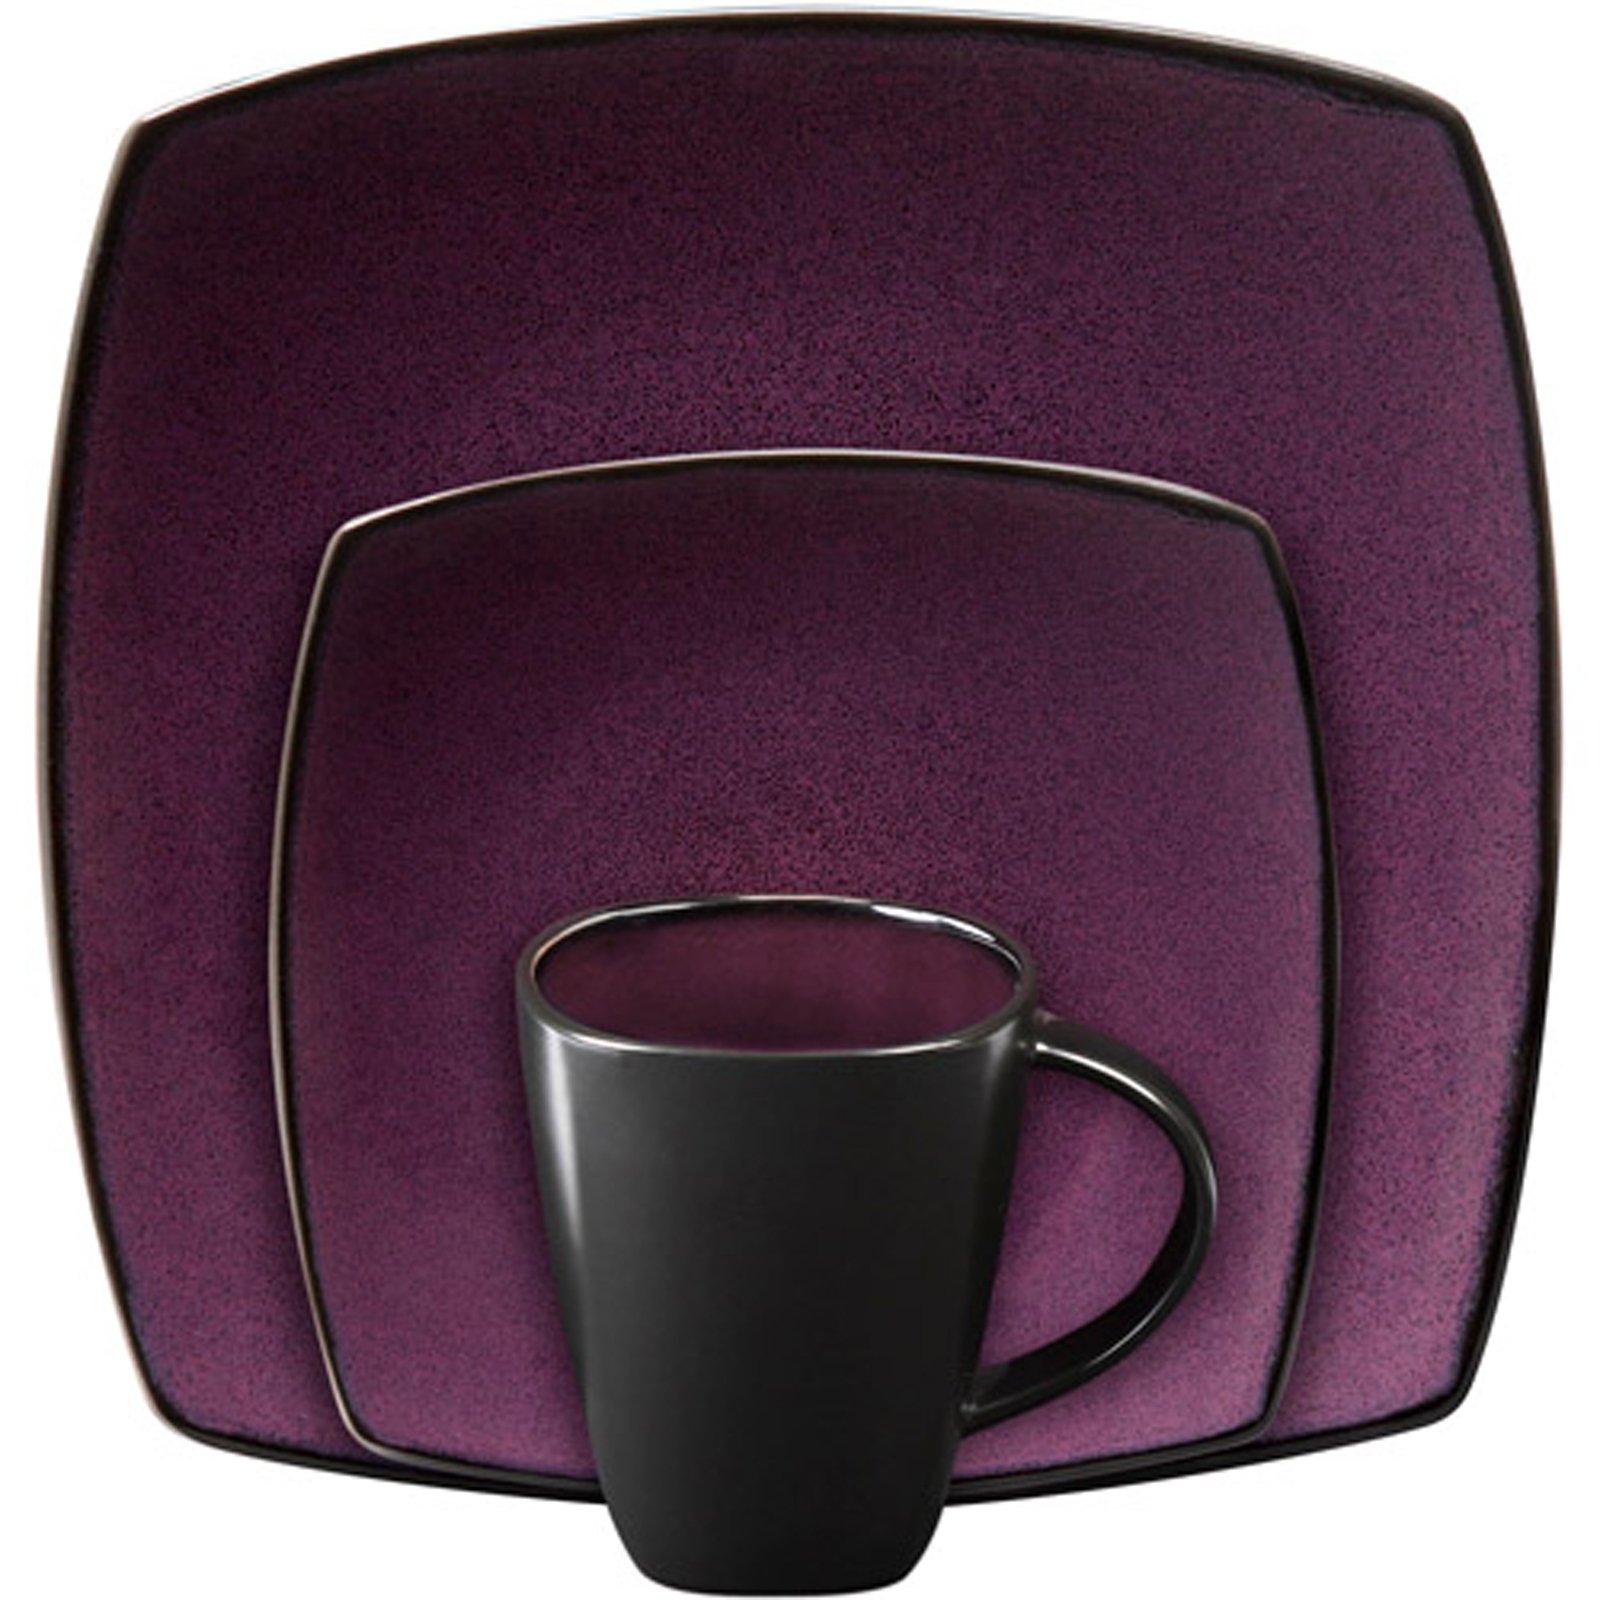 Gibson Soho Lounge Purple 16 Piece Dinnerware Set